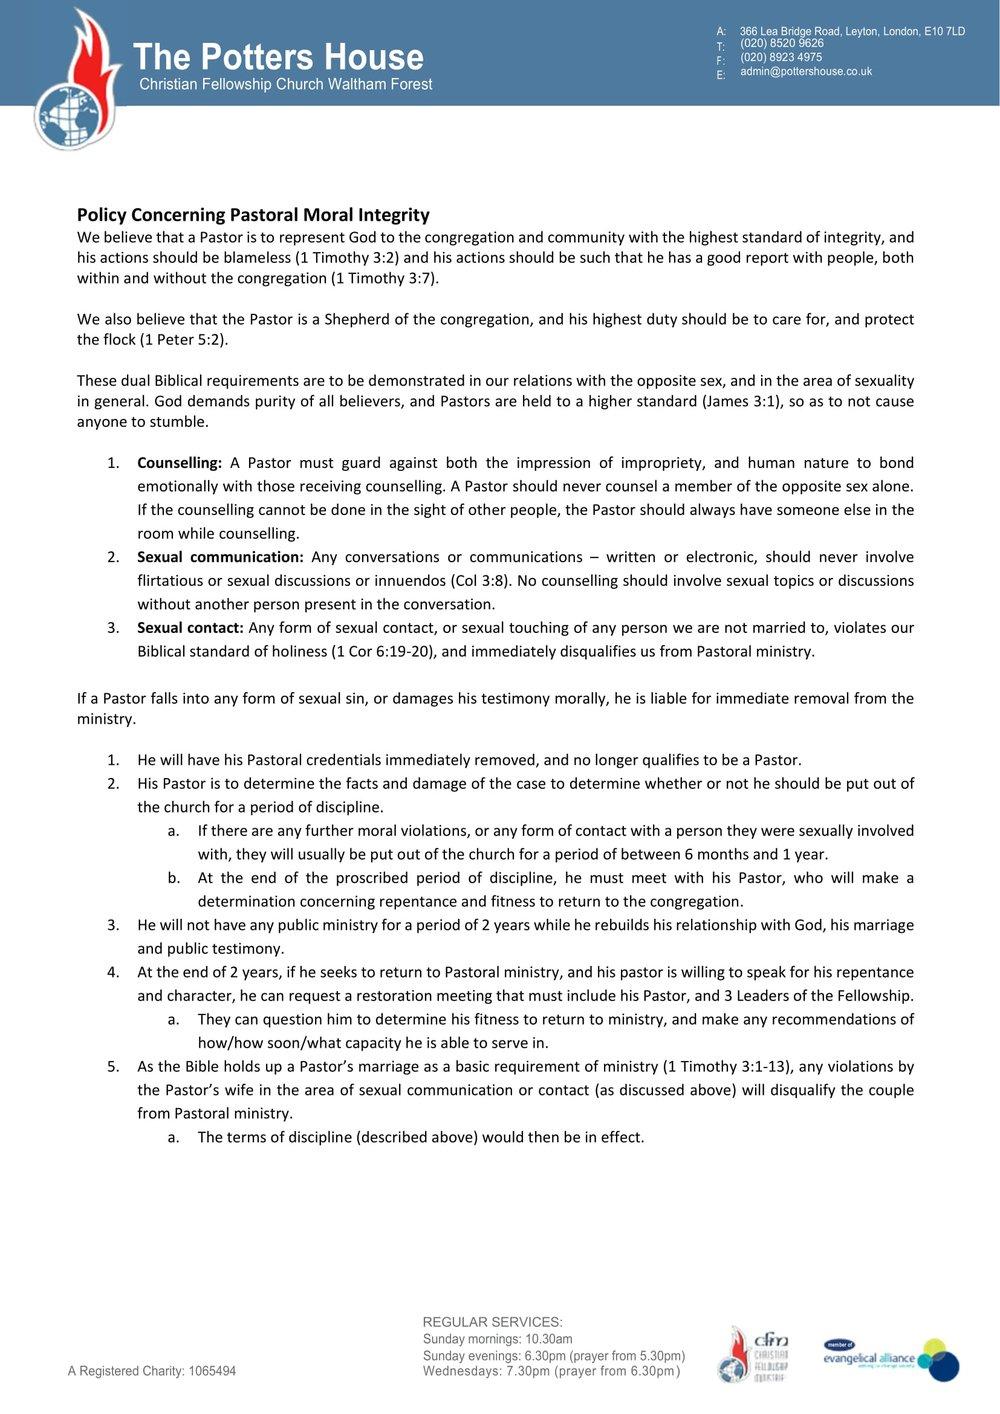 Ministry integrirty rev 02-1.jpg